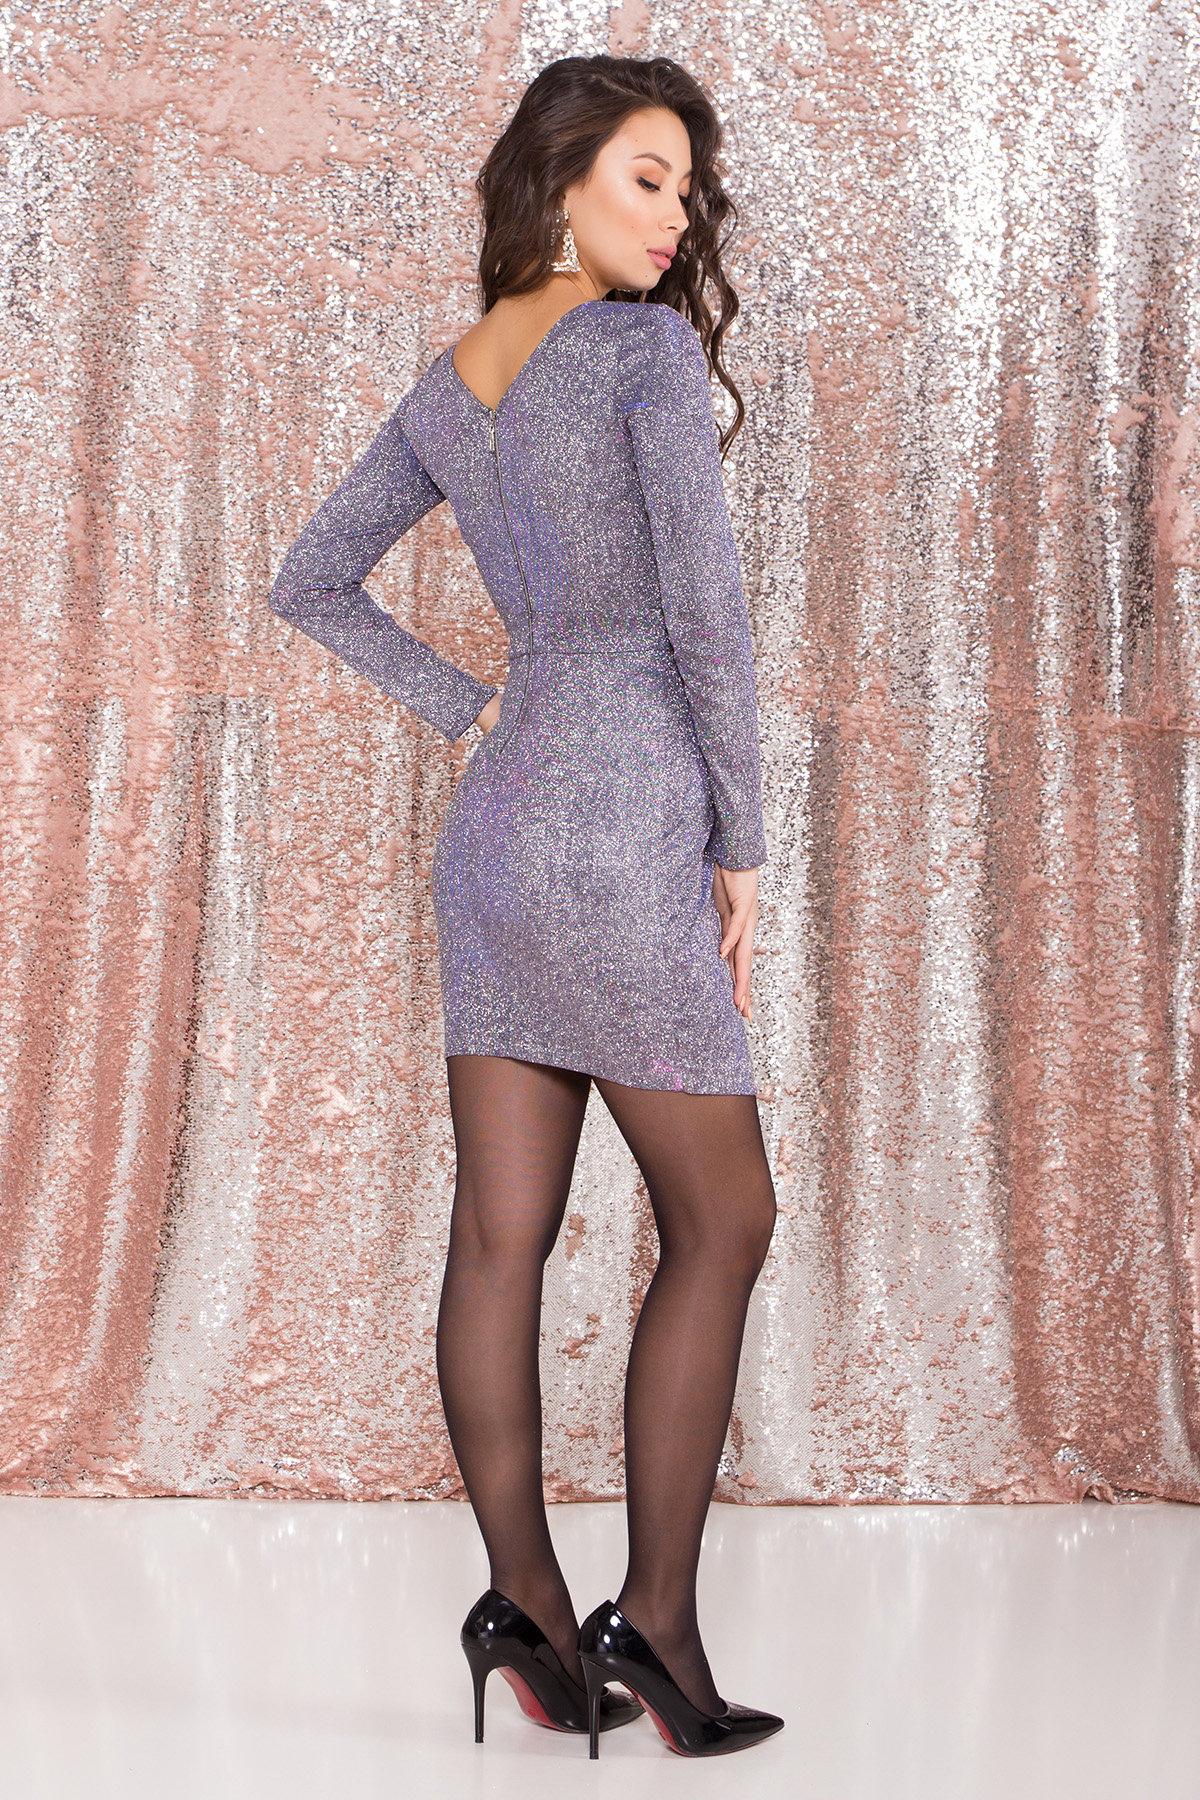 Коктейльное платье Кристал 8346 Цвет: Серебро/электрик/фиолет